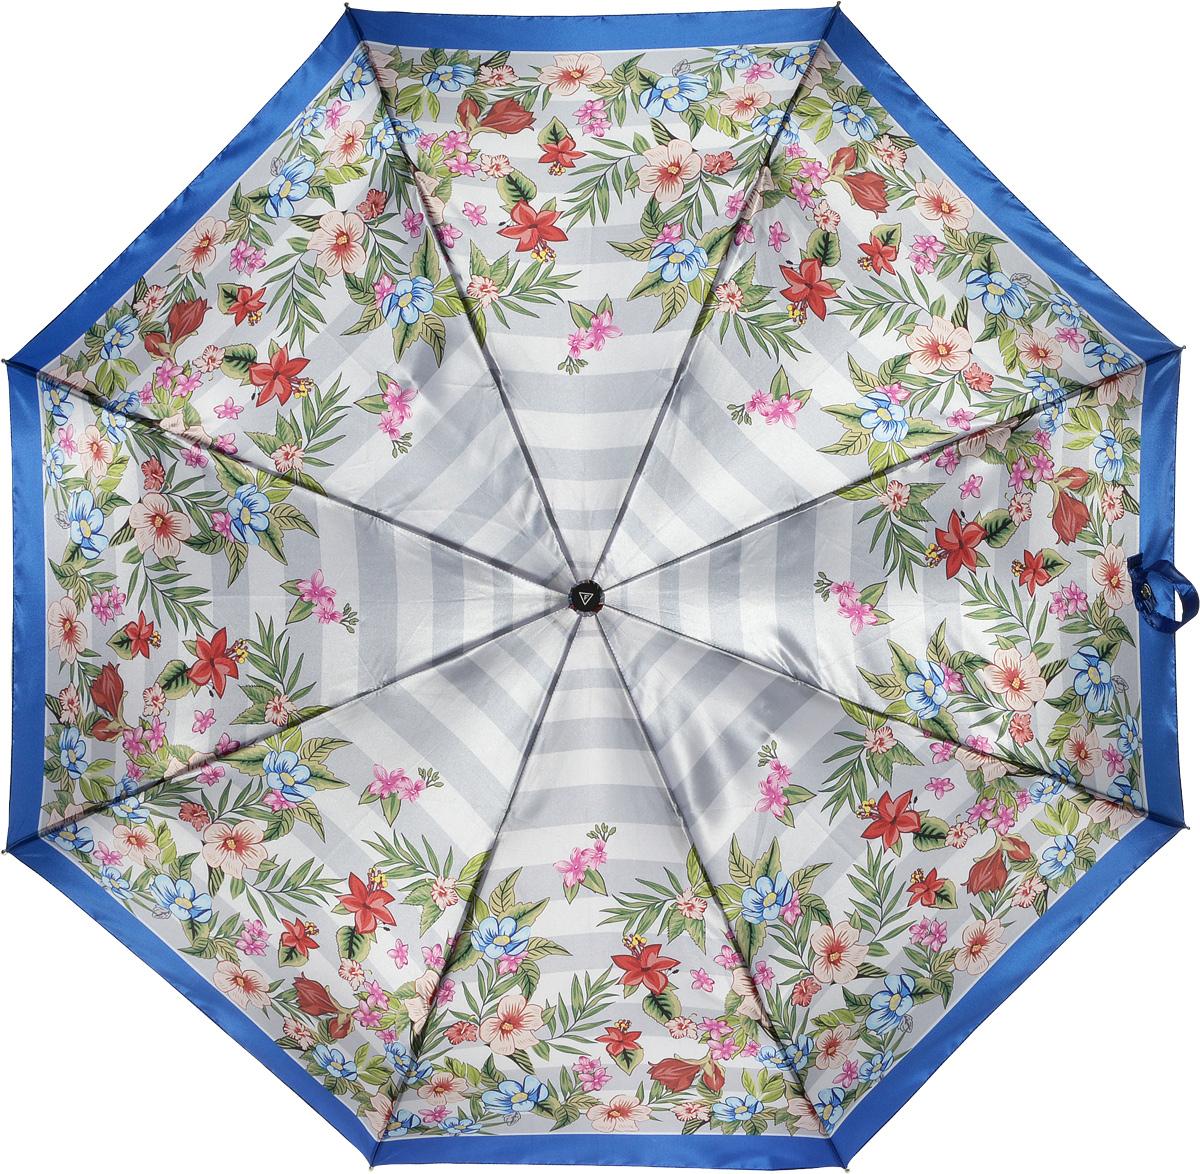 Зонт женский Fabretti, автомат, 3 сложения, цвет: мультиколор. L-16105-9L-16105-9Зонт женский Fabretti, облегченный суперавтомат, 3 сложения